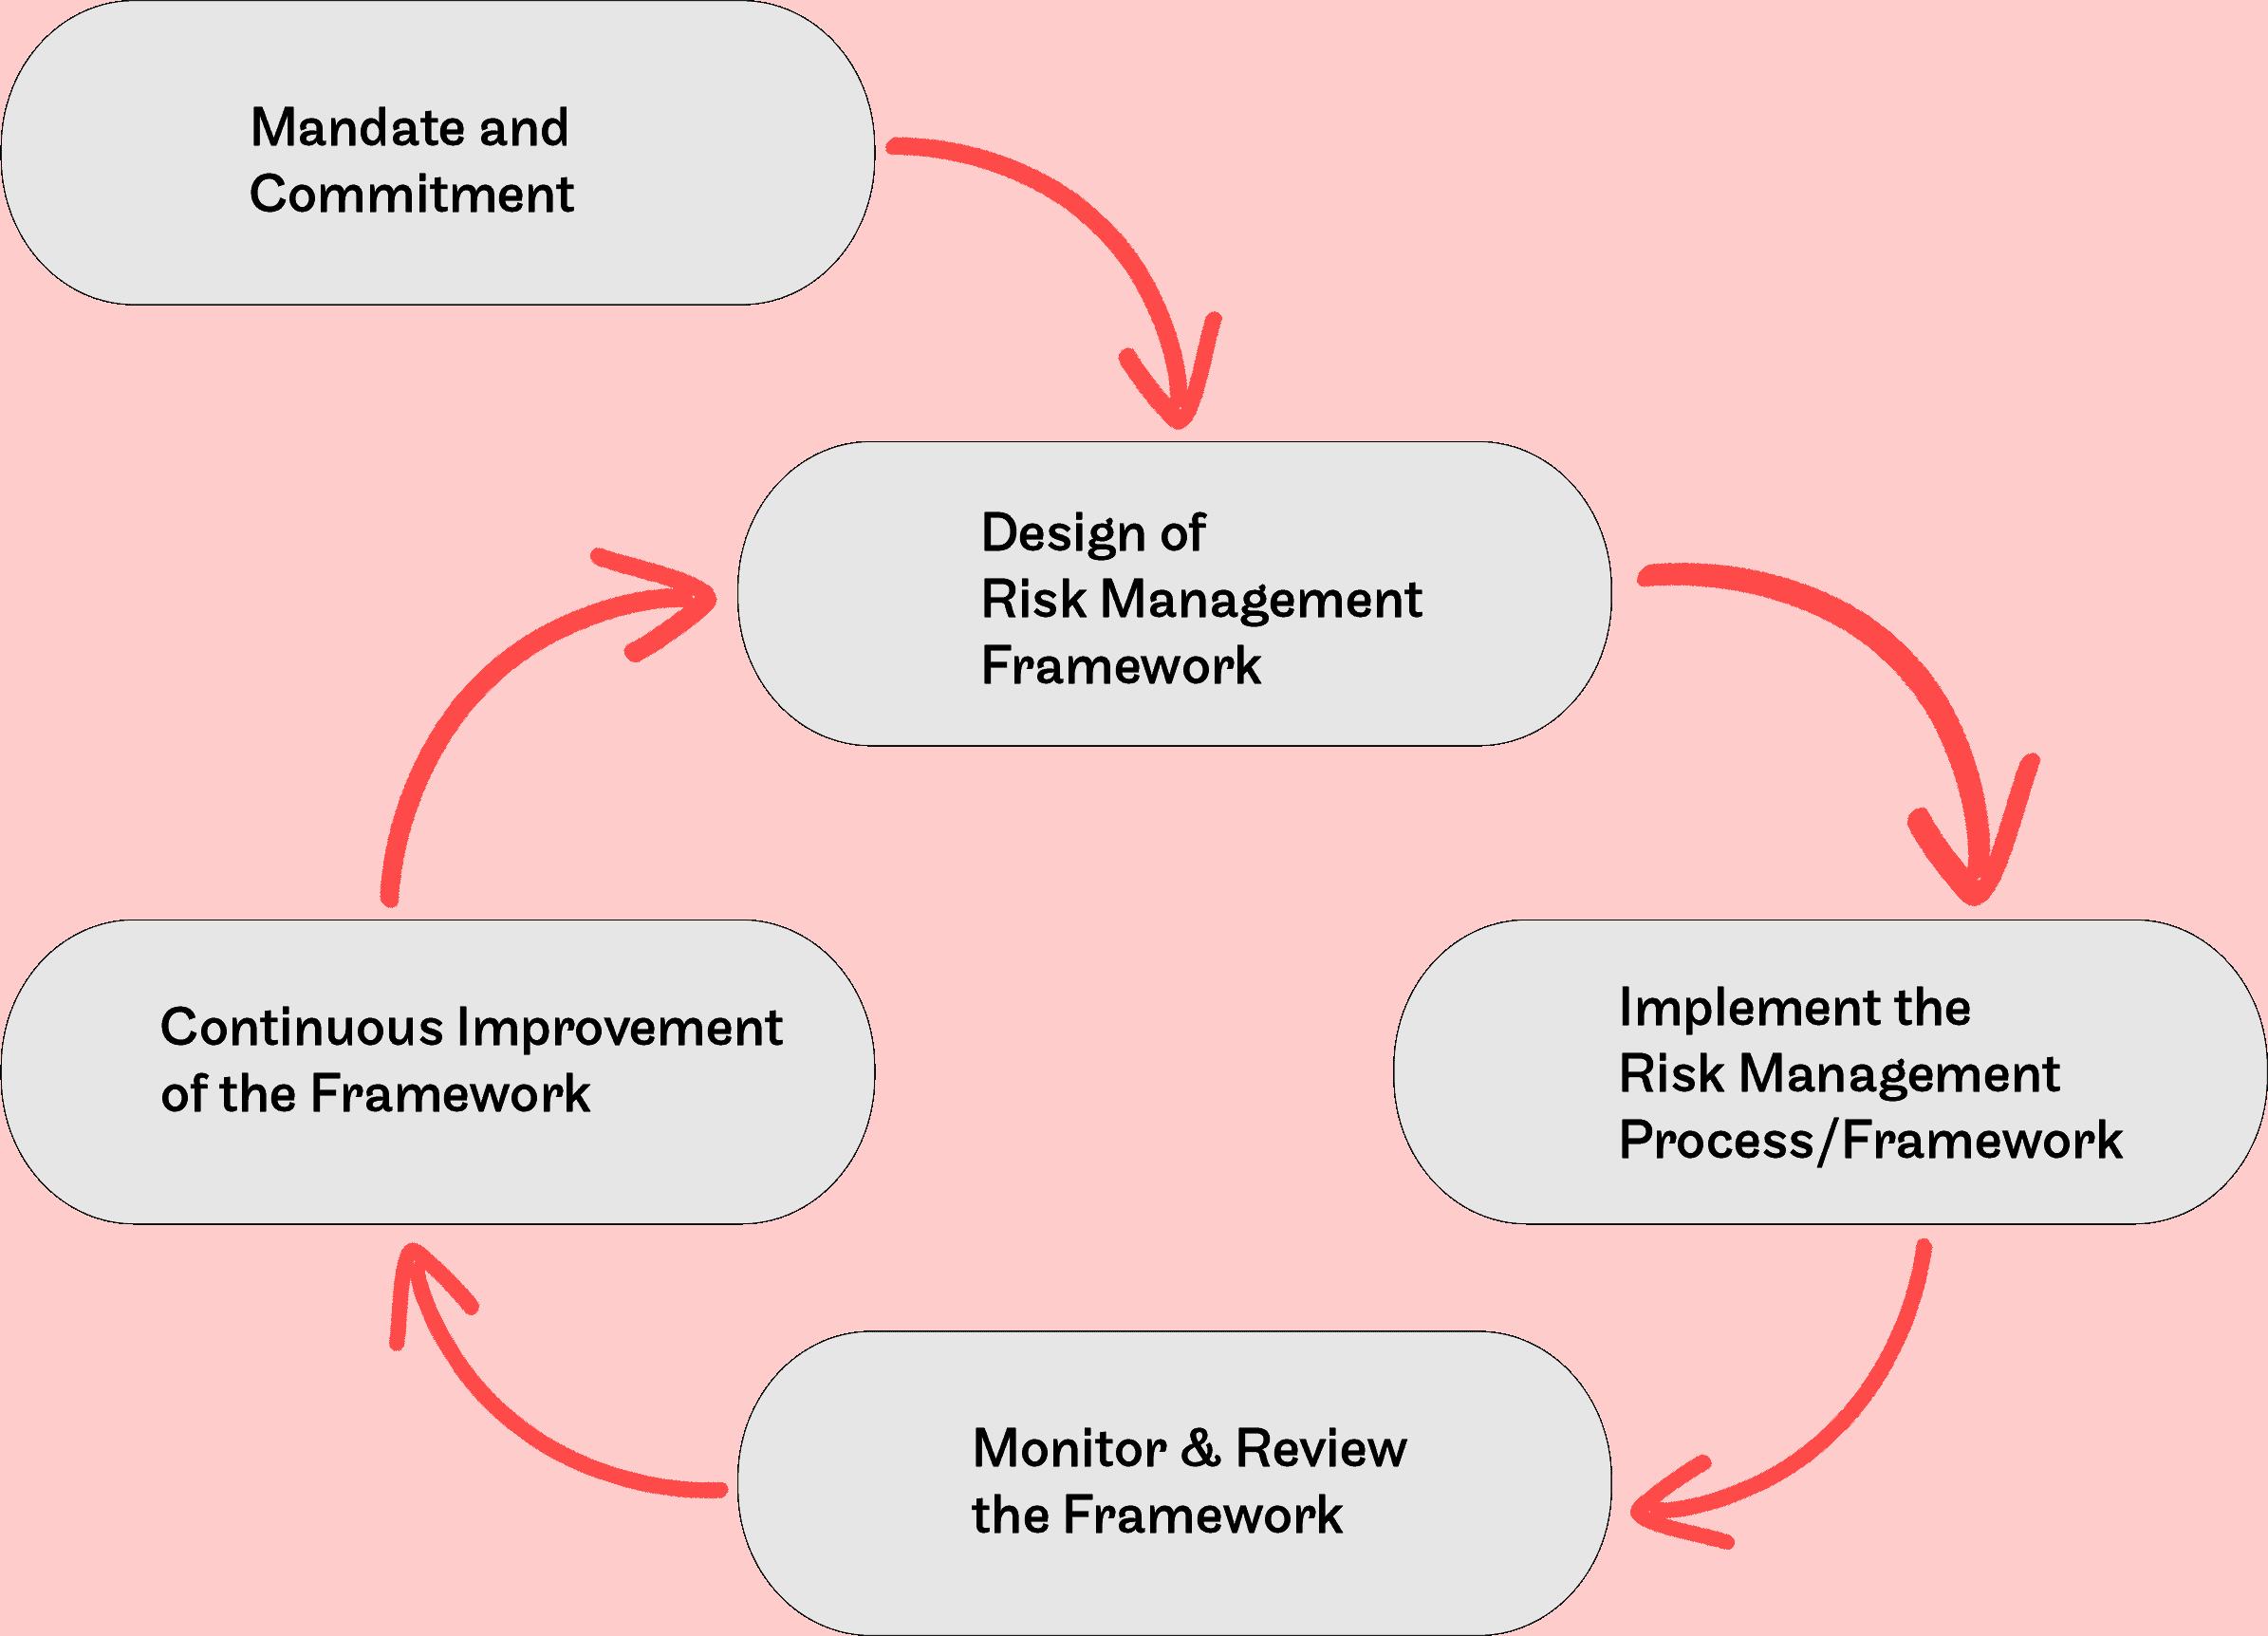 https://accendoreliability.com/wp-content/uploads/2017/08/ERMFrameworkflowchart.png